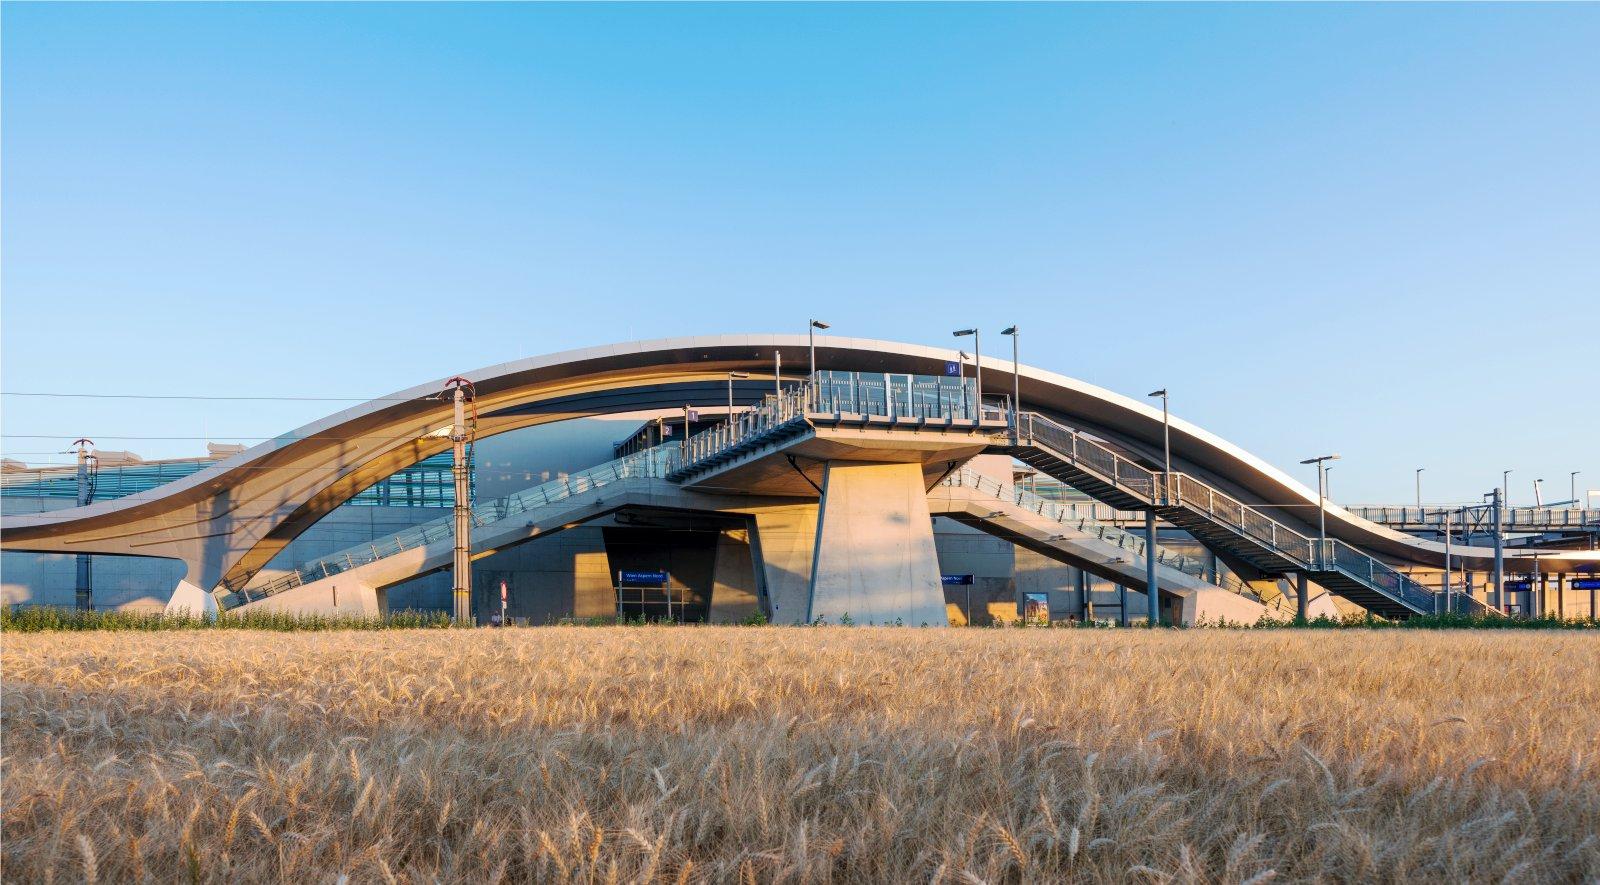 Station Aspern